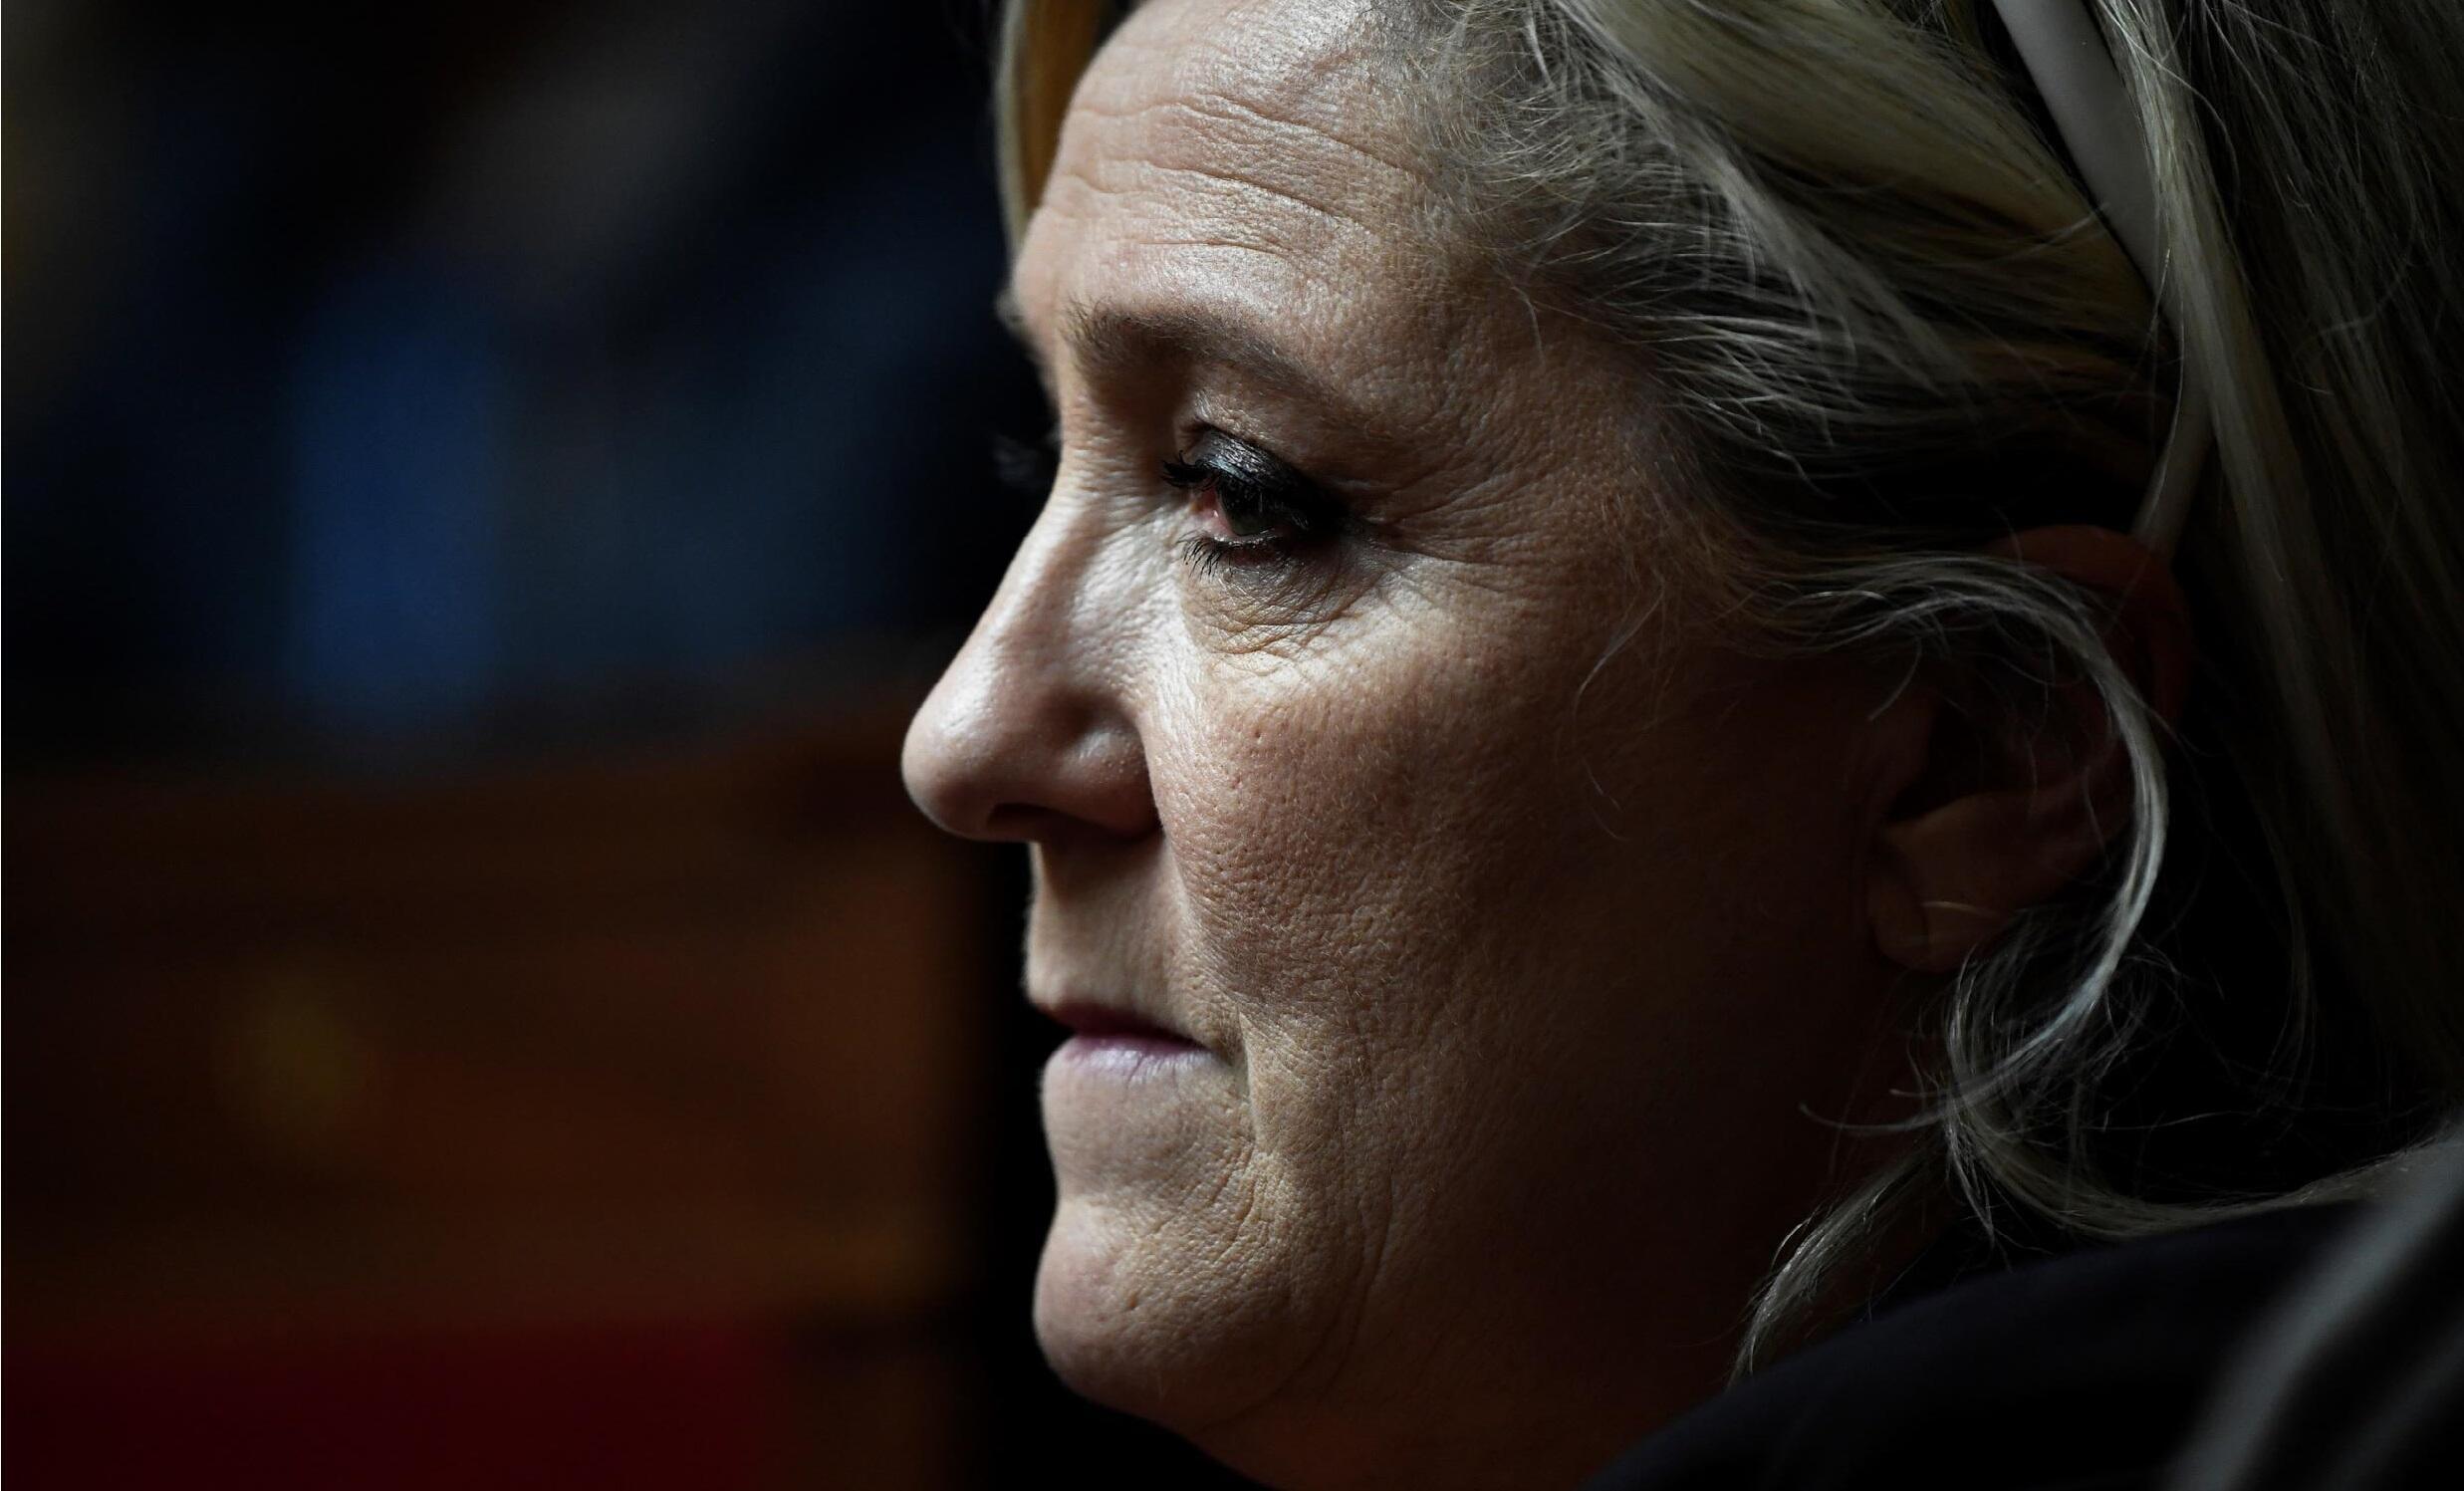 2021-02-10 france politics far-right national rally marine le pen rassemblement national